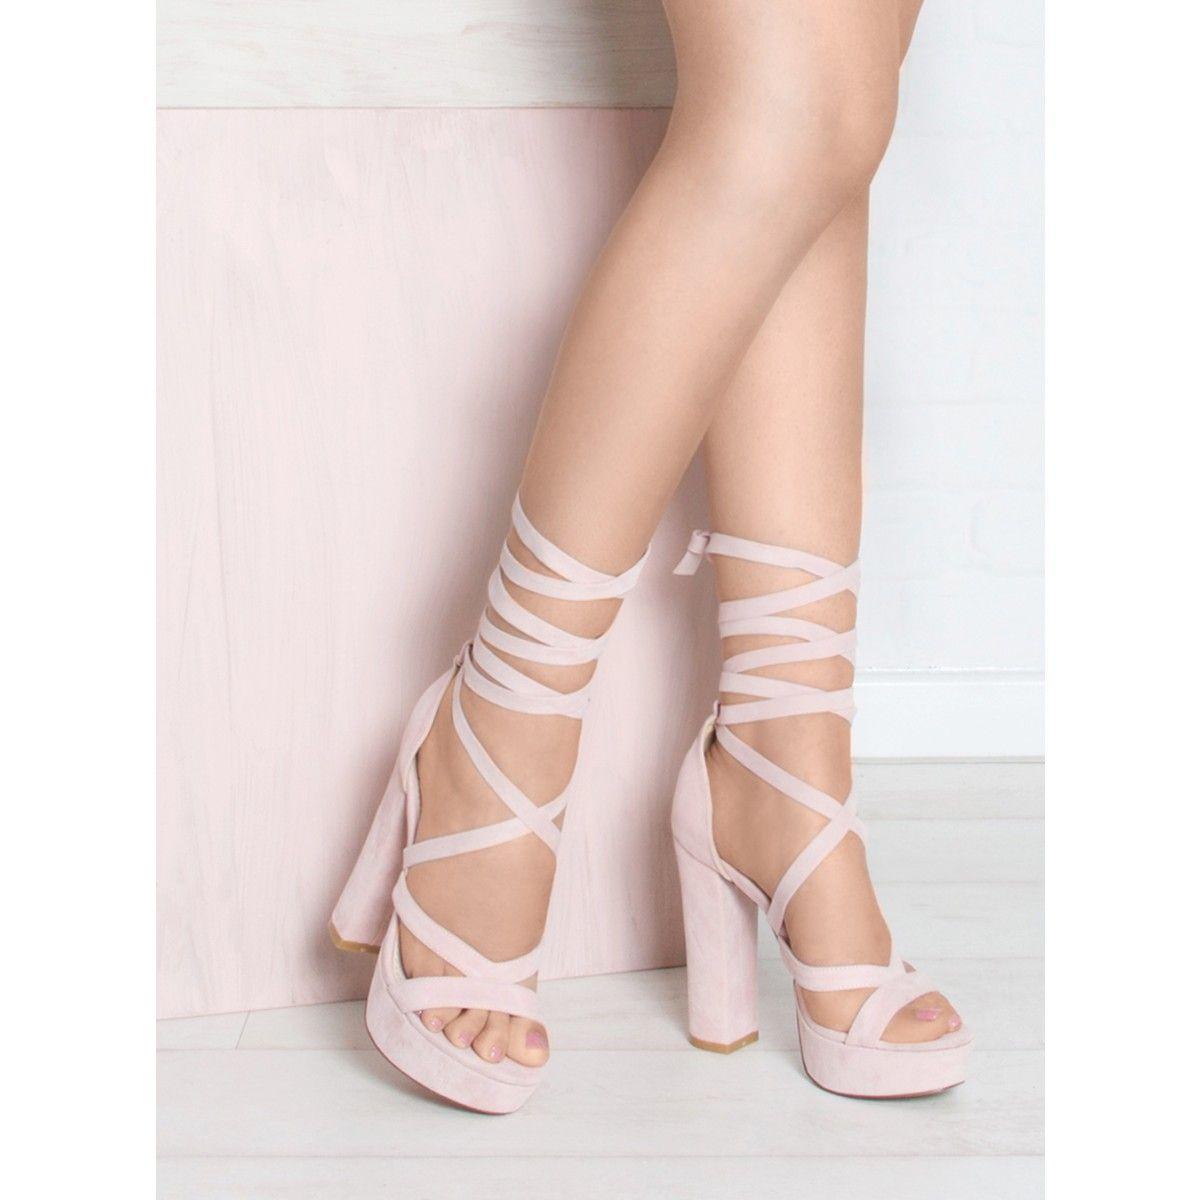 Amelia Pink Suede Lace Up Platform Heels - Lace Up Heels - HEELS ...